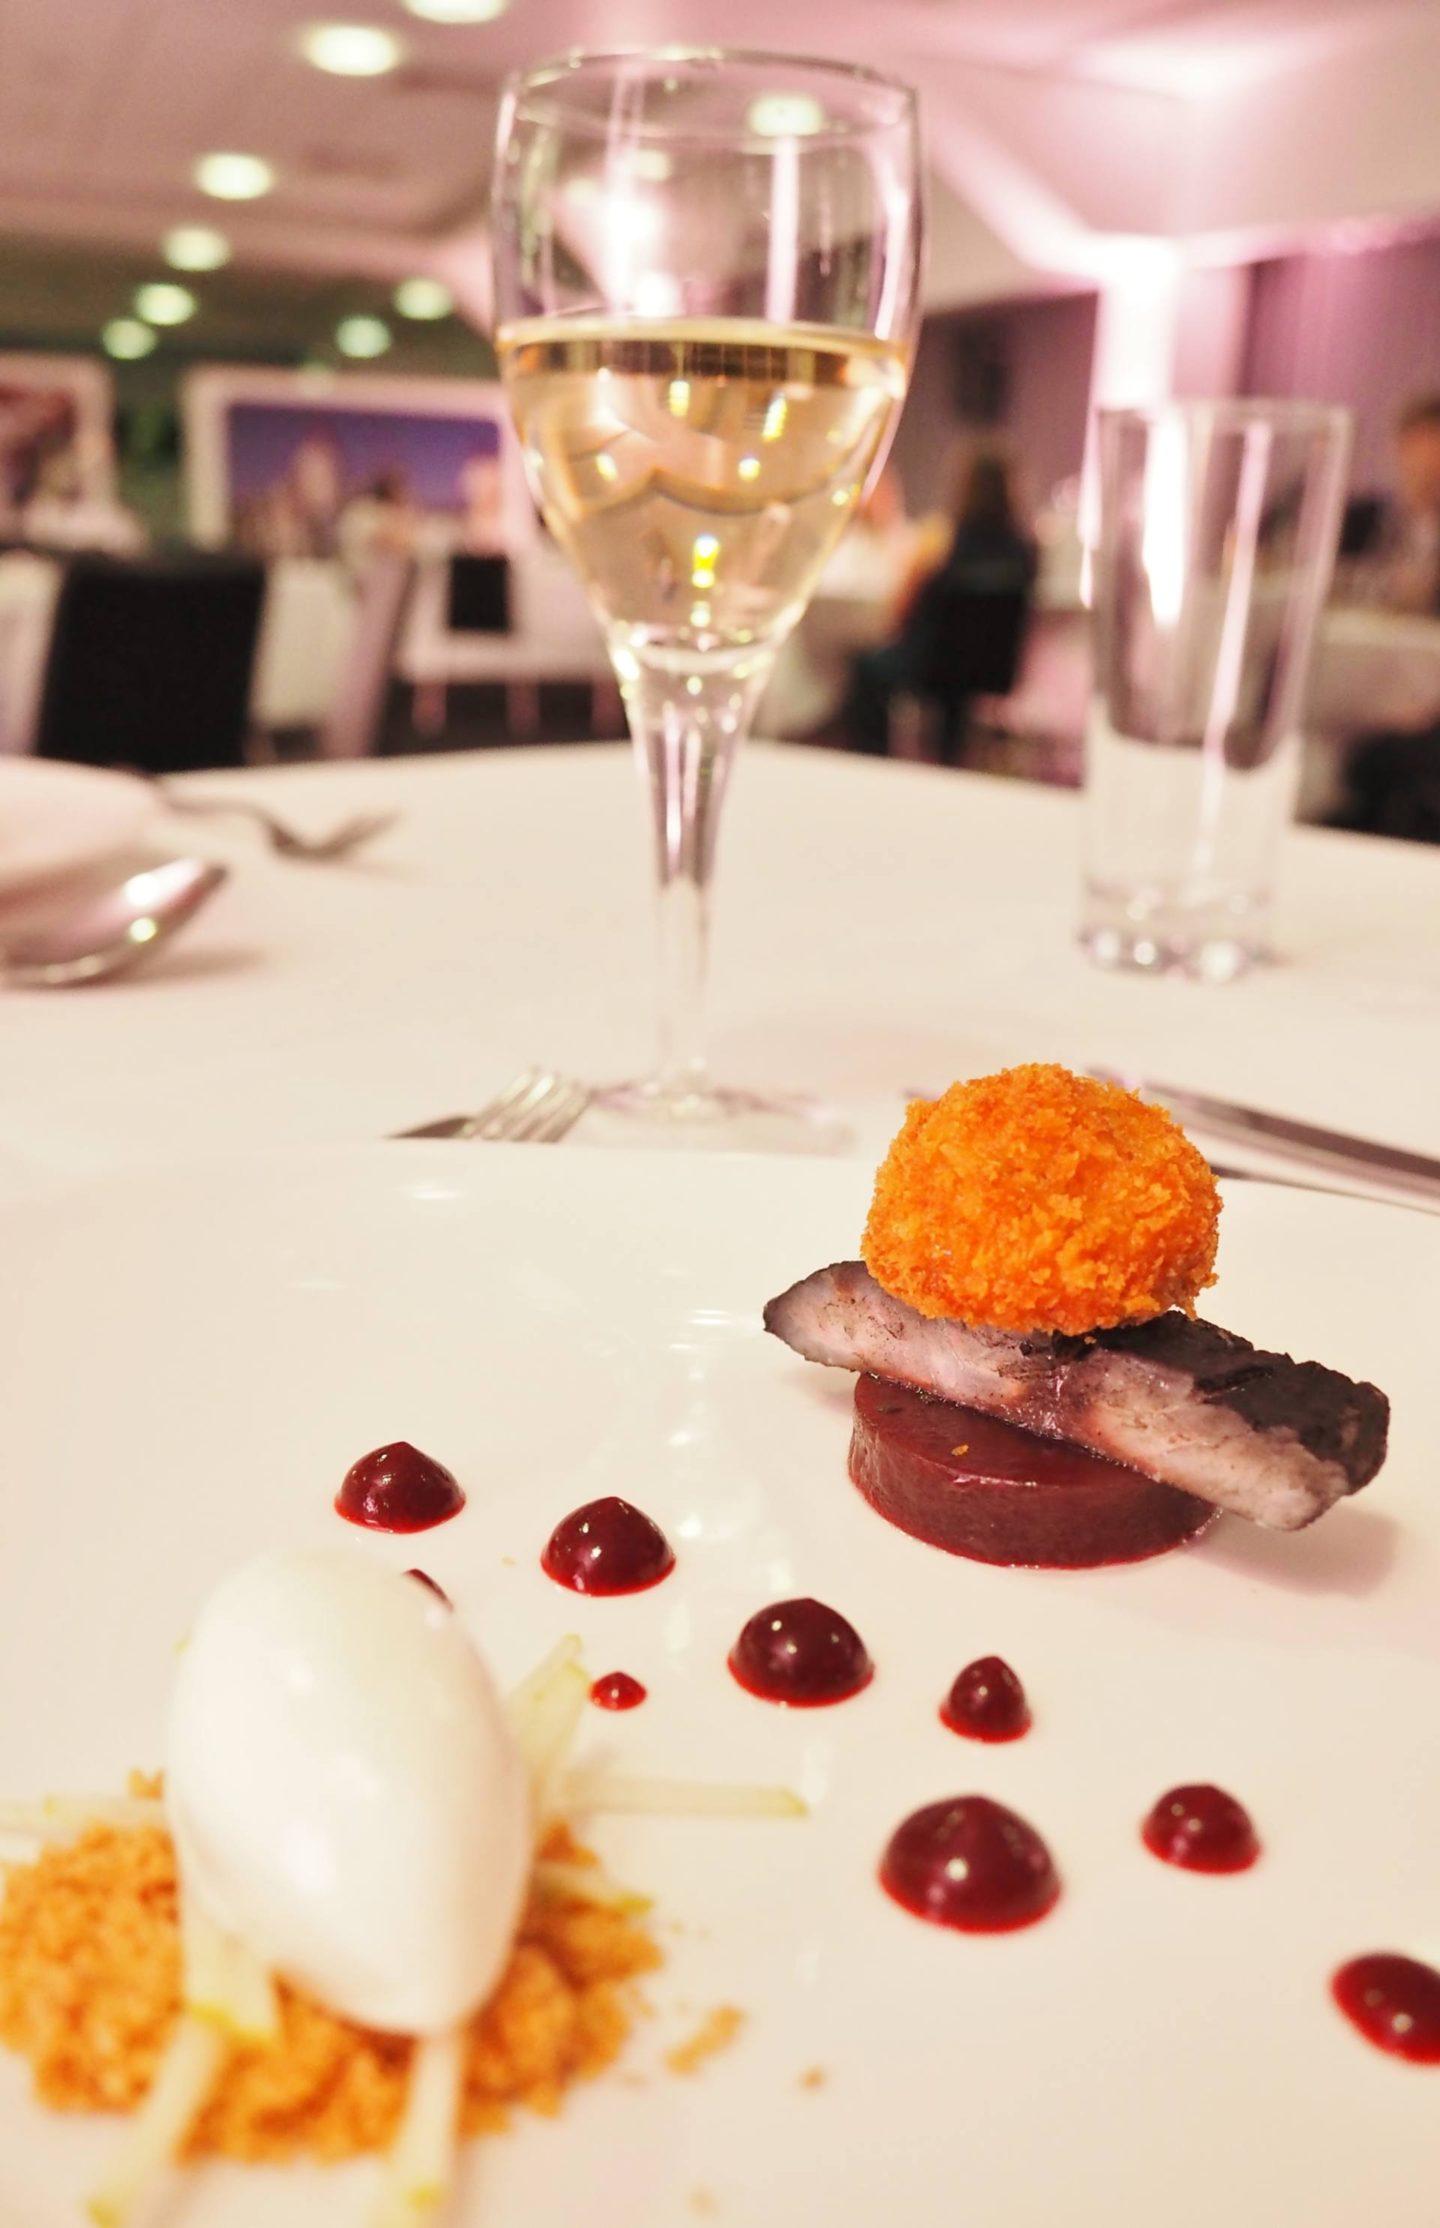 Emma Victoria Stokes Elegant Eat Fine Dining Edgbaston Cricket Ground Stone Bass Marinated In Squid Ink